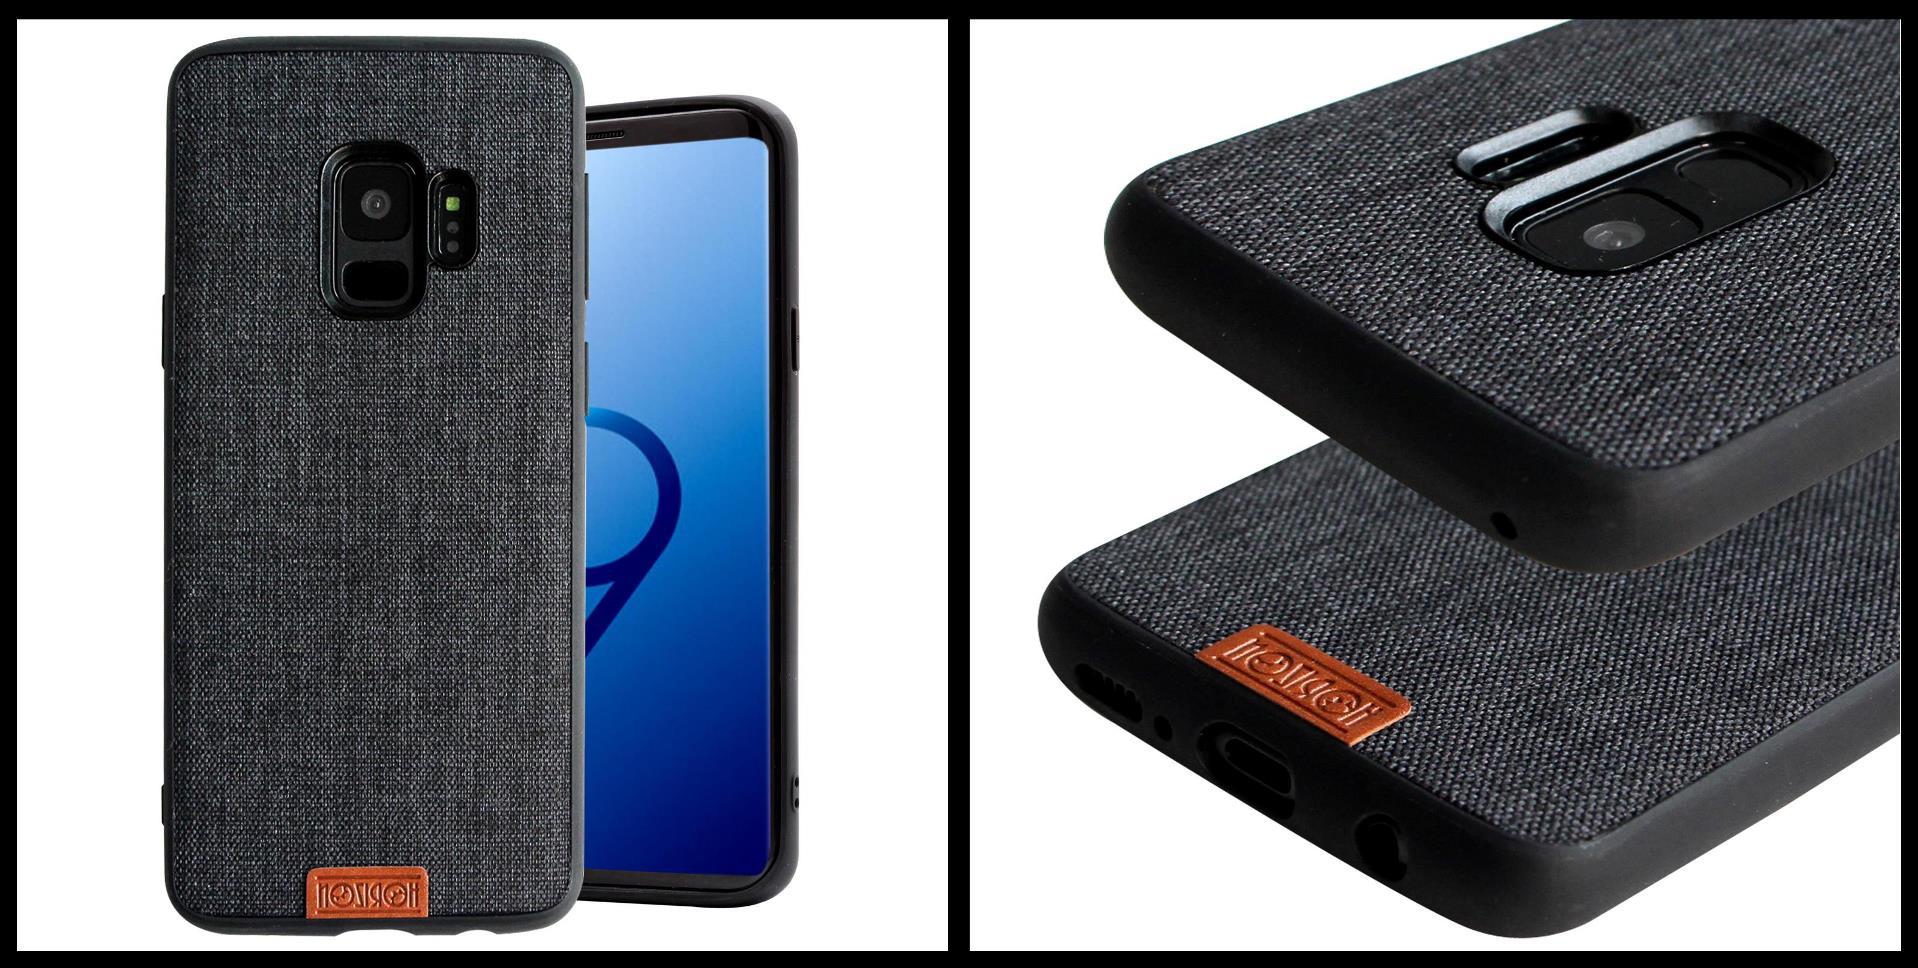 noziroh-jeans-samsung-galaxy-s9-cover-case-shockproof-slim-design-black-blue-red